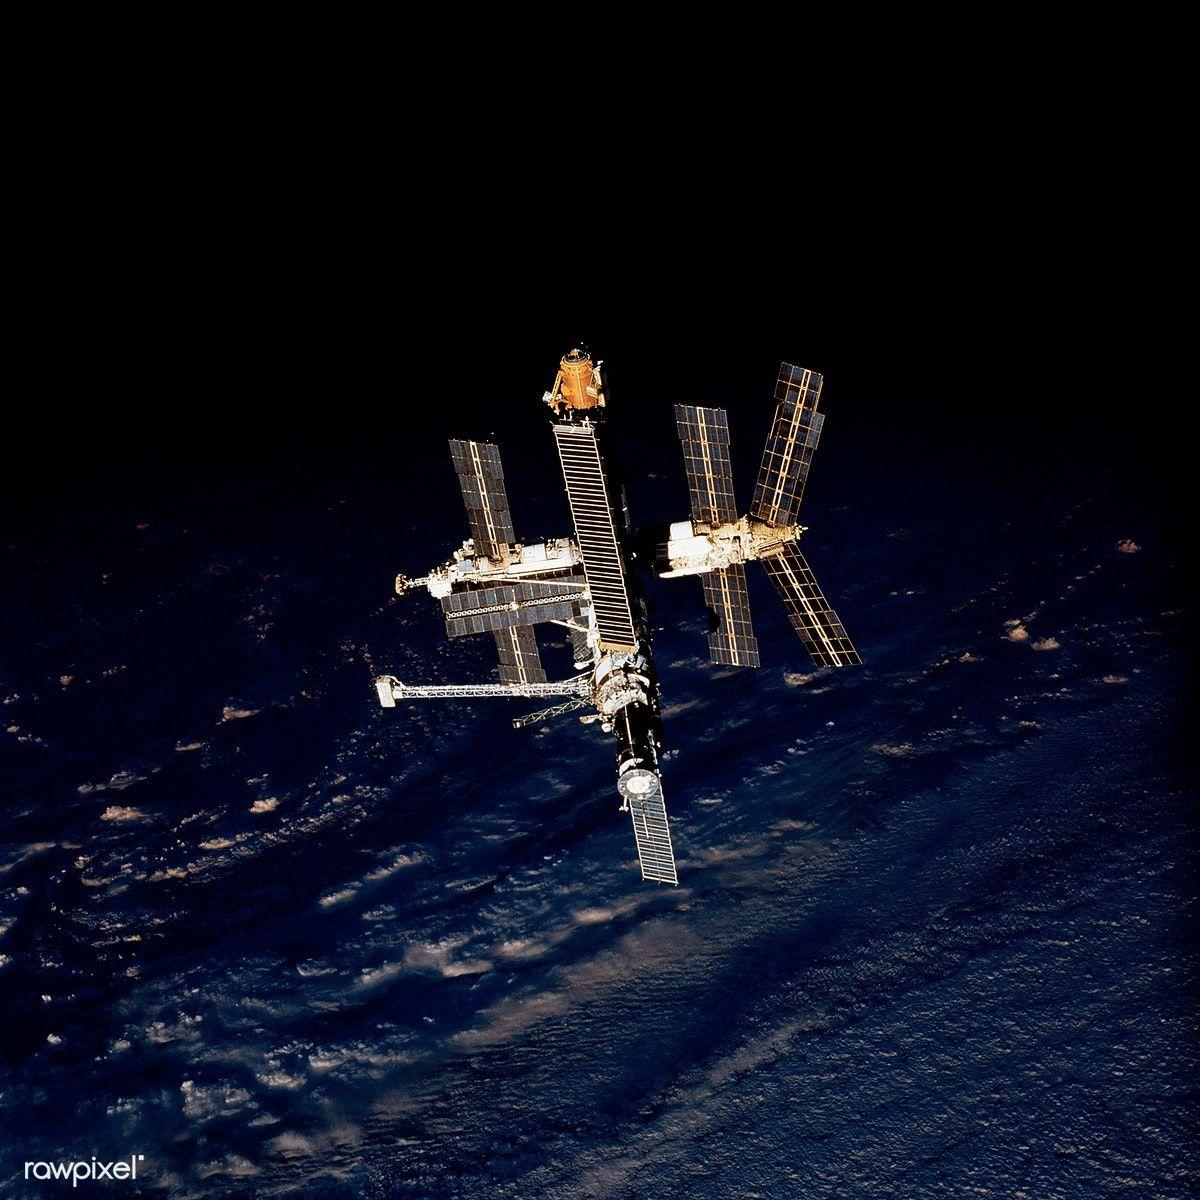 Following The Space Shuttle Atlantis